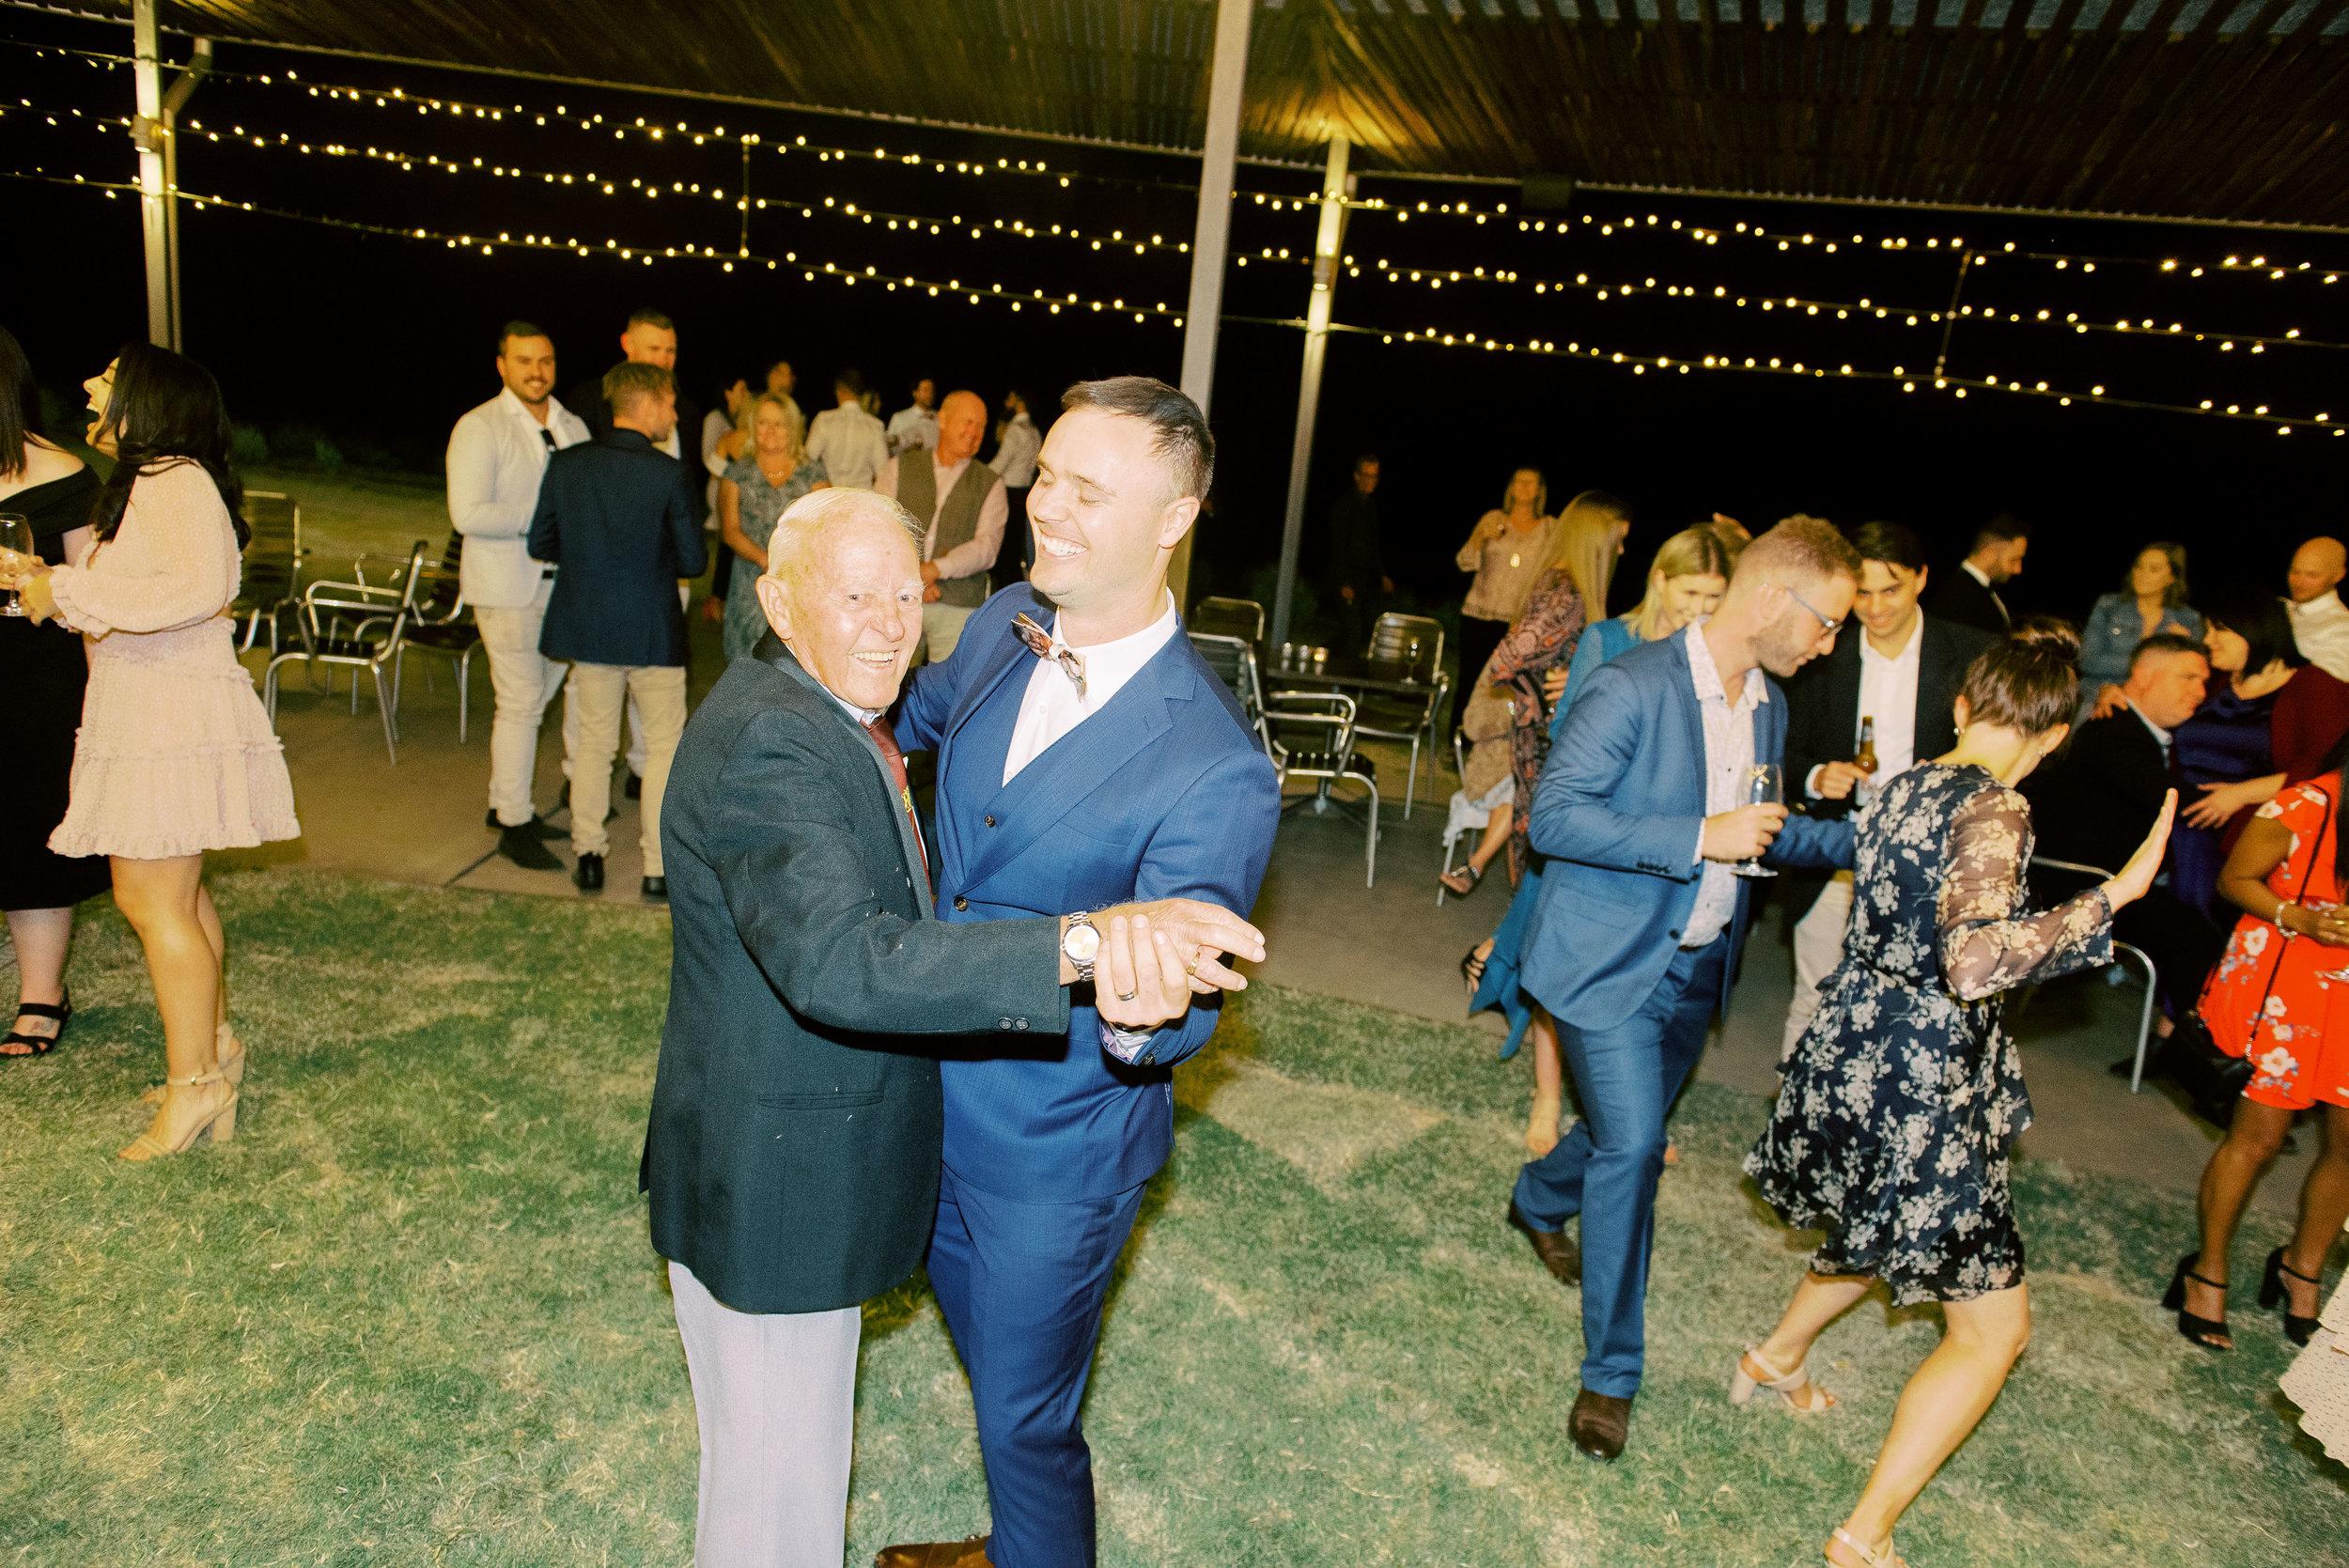 Kooroomba-Vineyard-Lavender-Farm-Wedding-Fine-Art-Lauren-Olivia-89.jpg